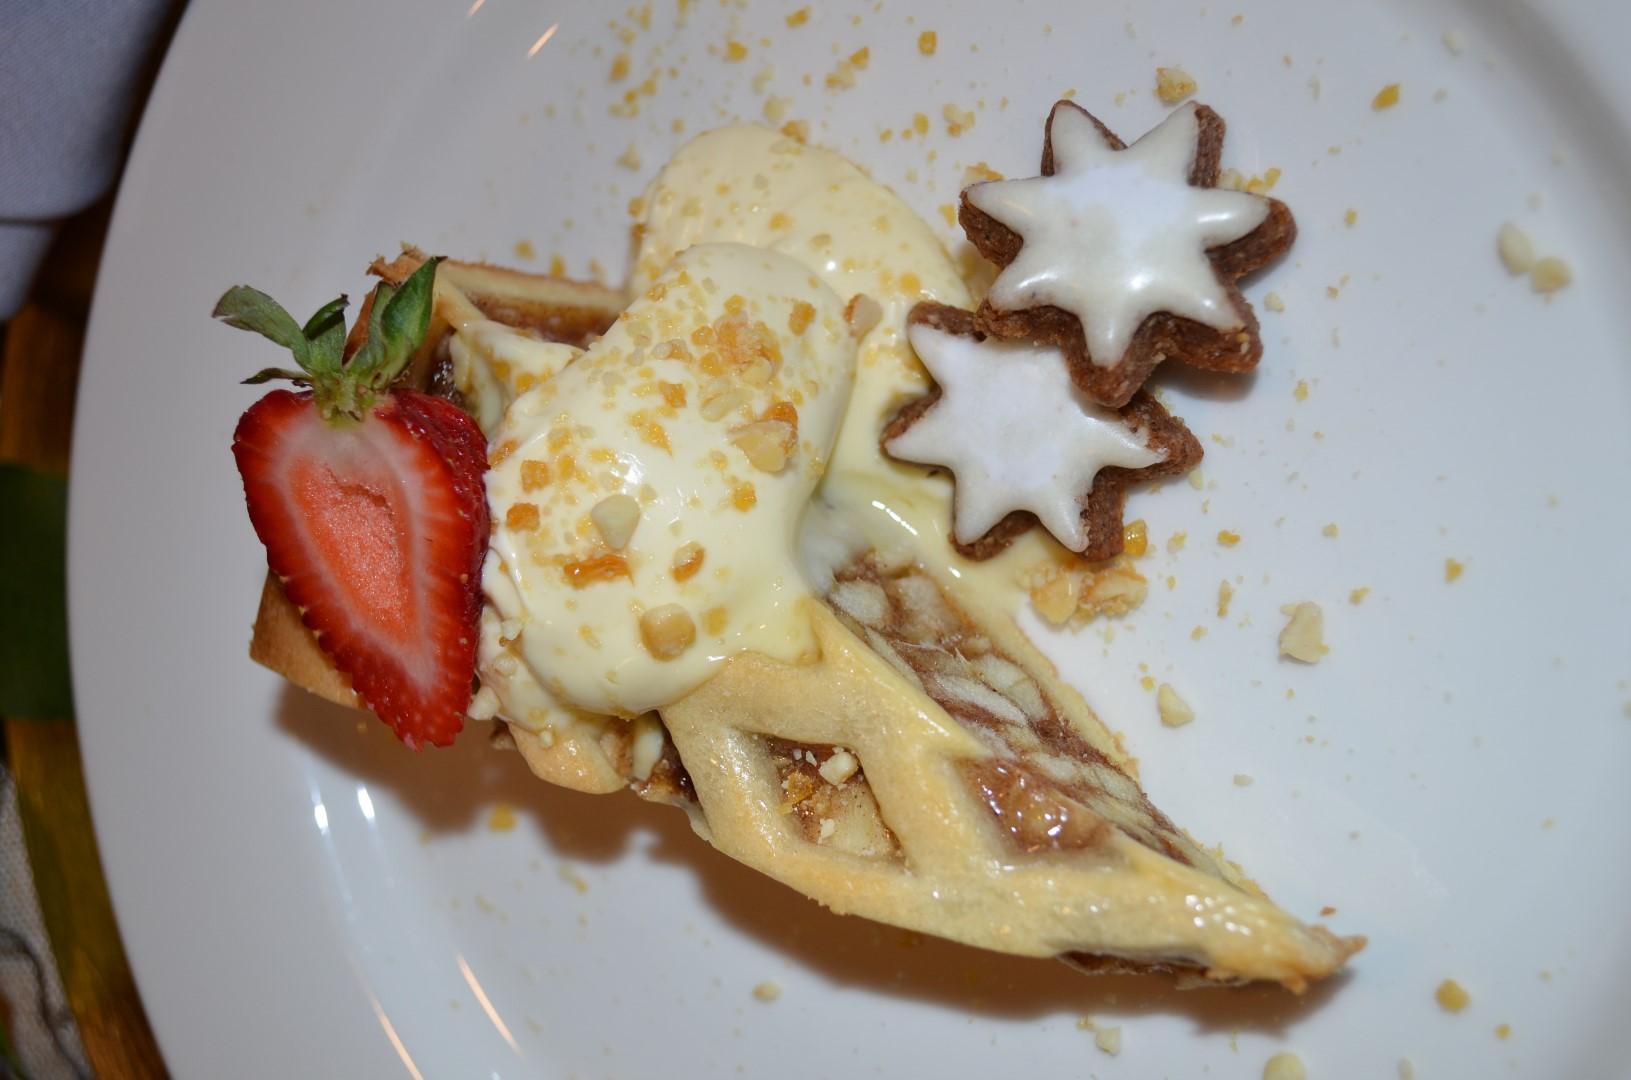 dessertAlt (Large)